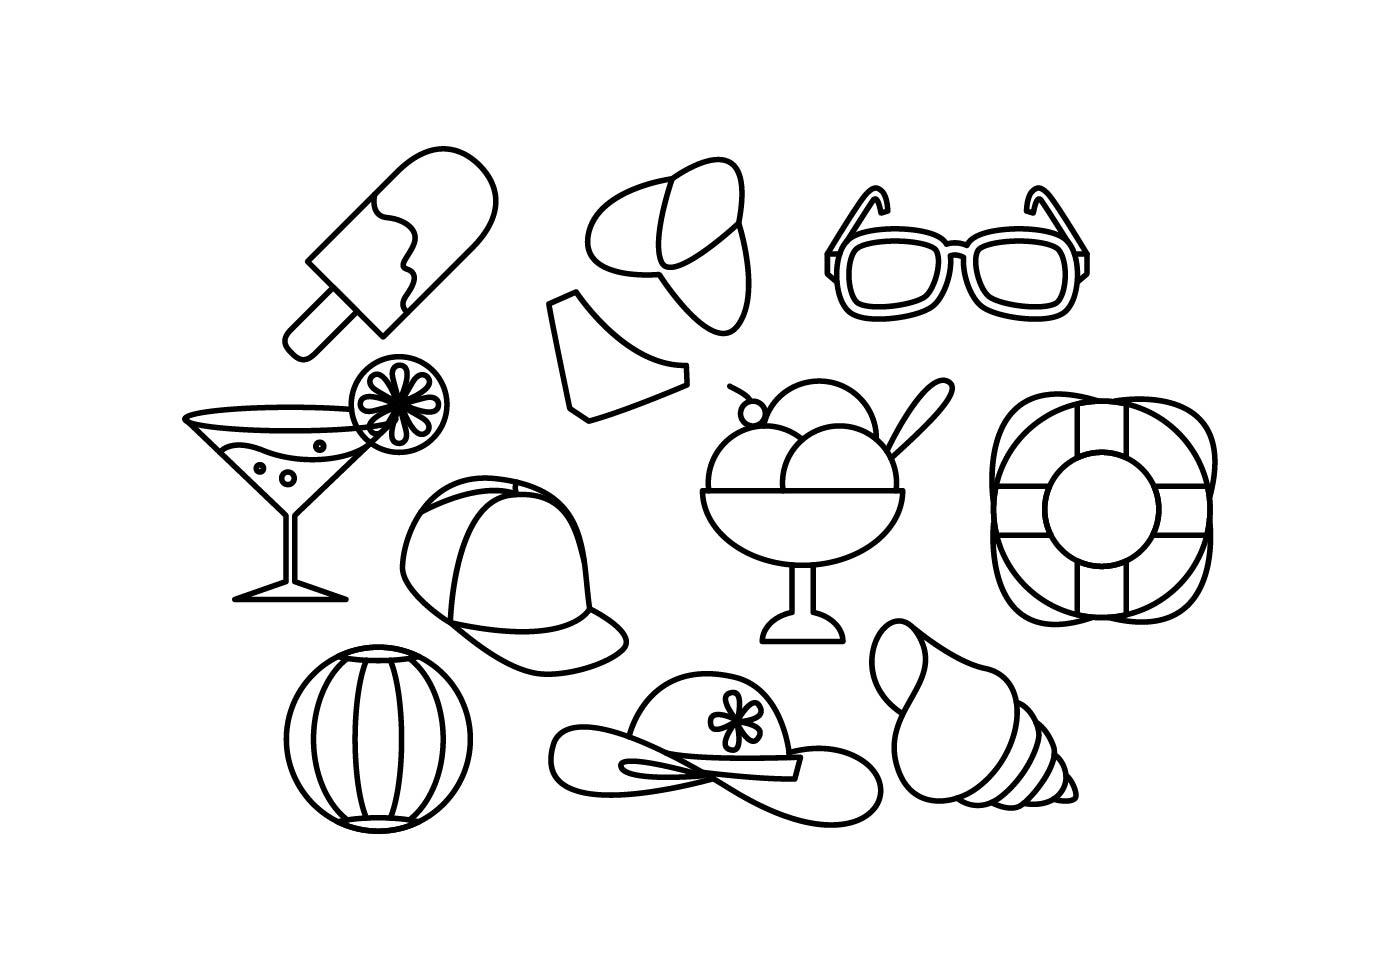 Free Summer Line Icon Vector - Download Free Vectors ...